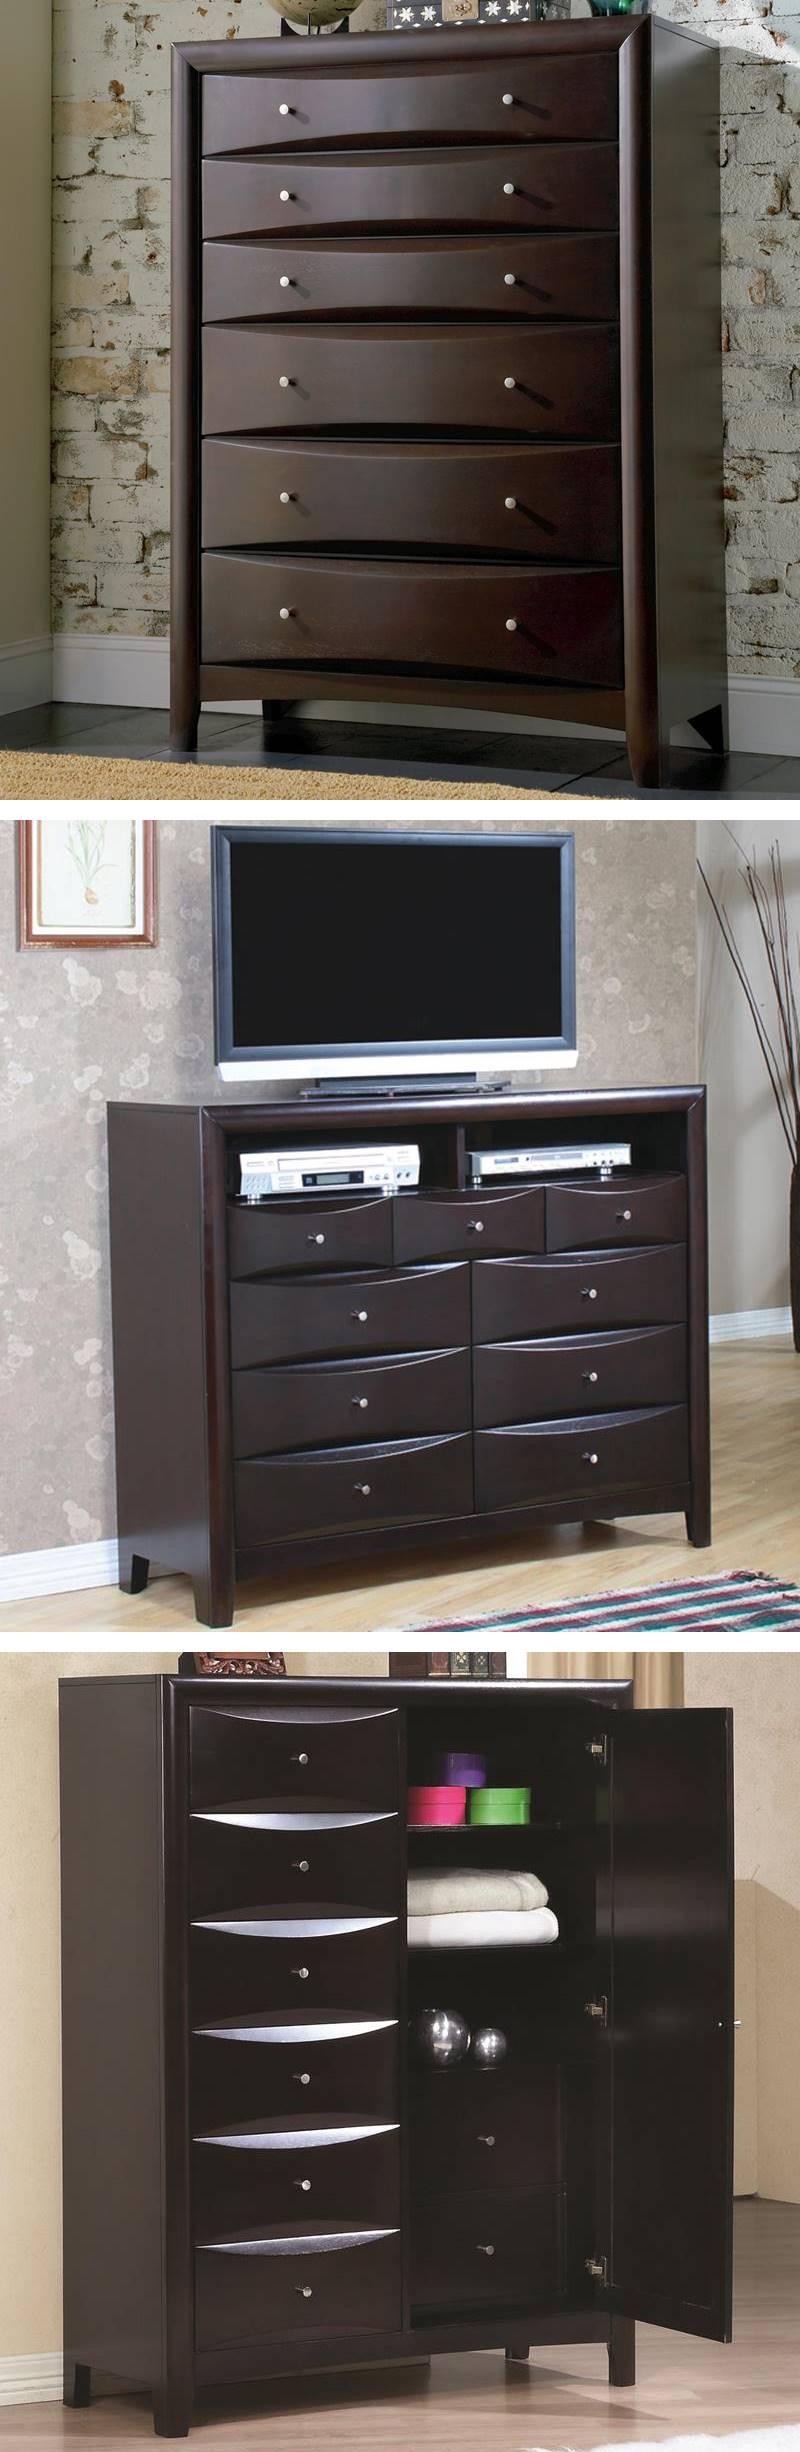 Dallas Designer Furniture Phoenix Bedroom Set With Large